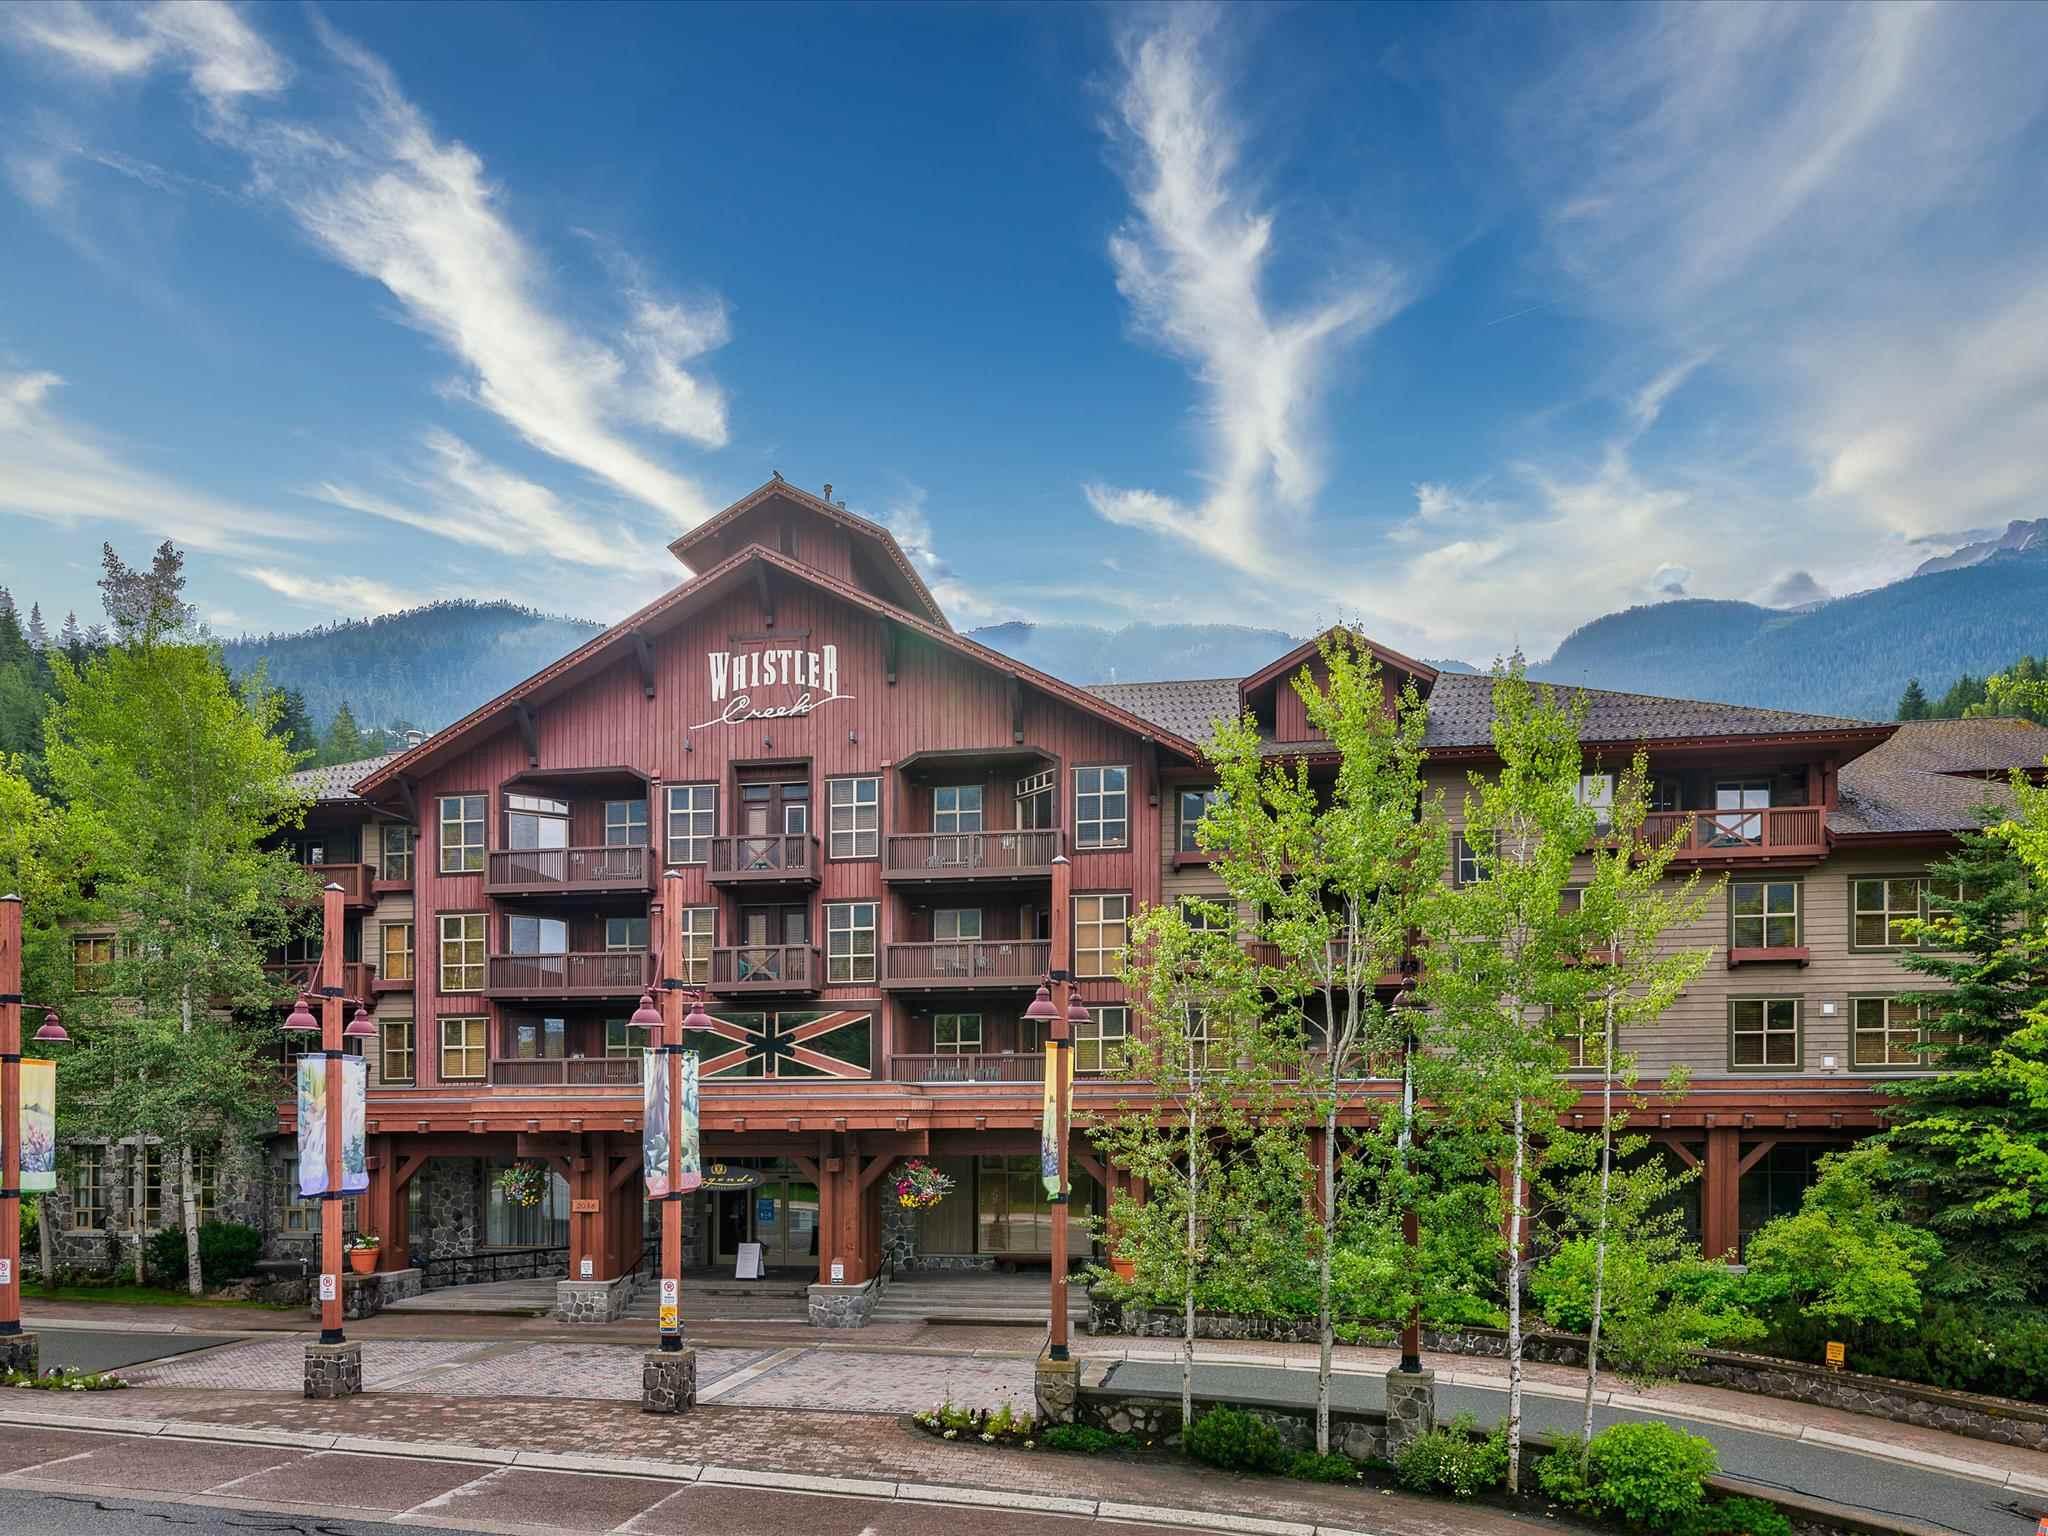 537A 2036 LONDON LANE - Whistler Creek Apartment/Condo for sale, 2 Bedrooms (R2604582)